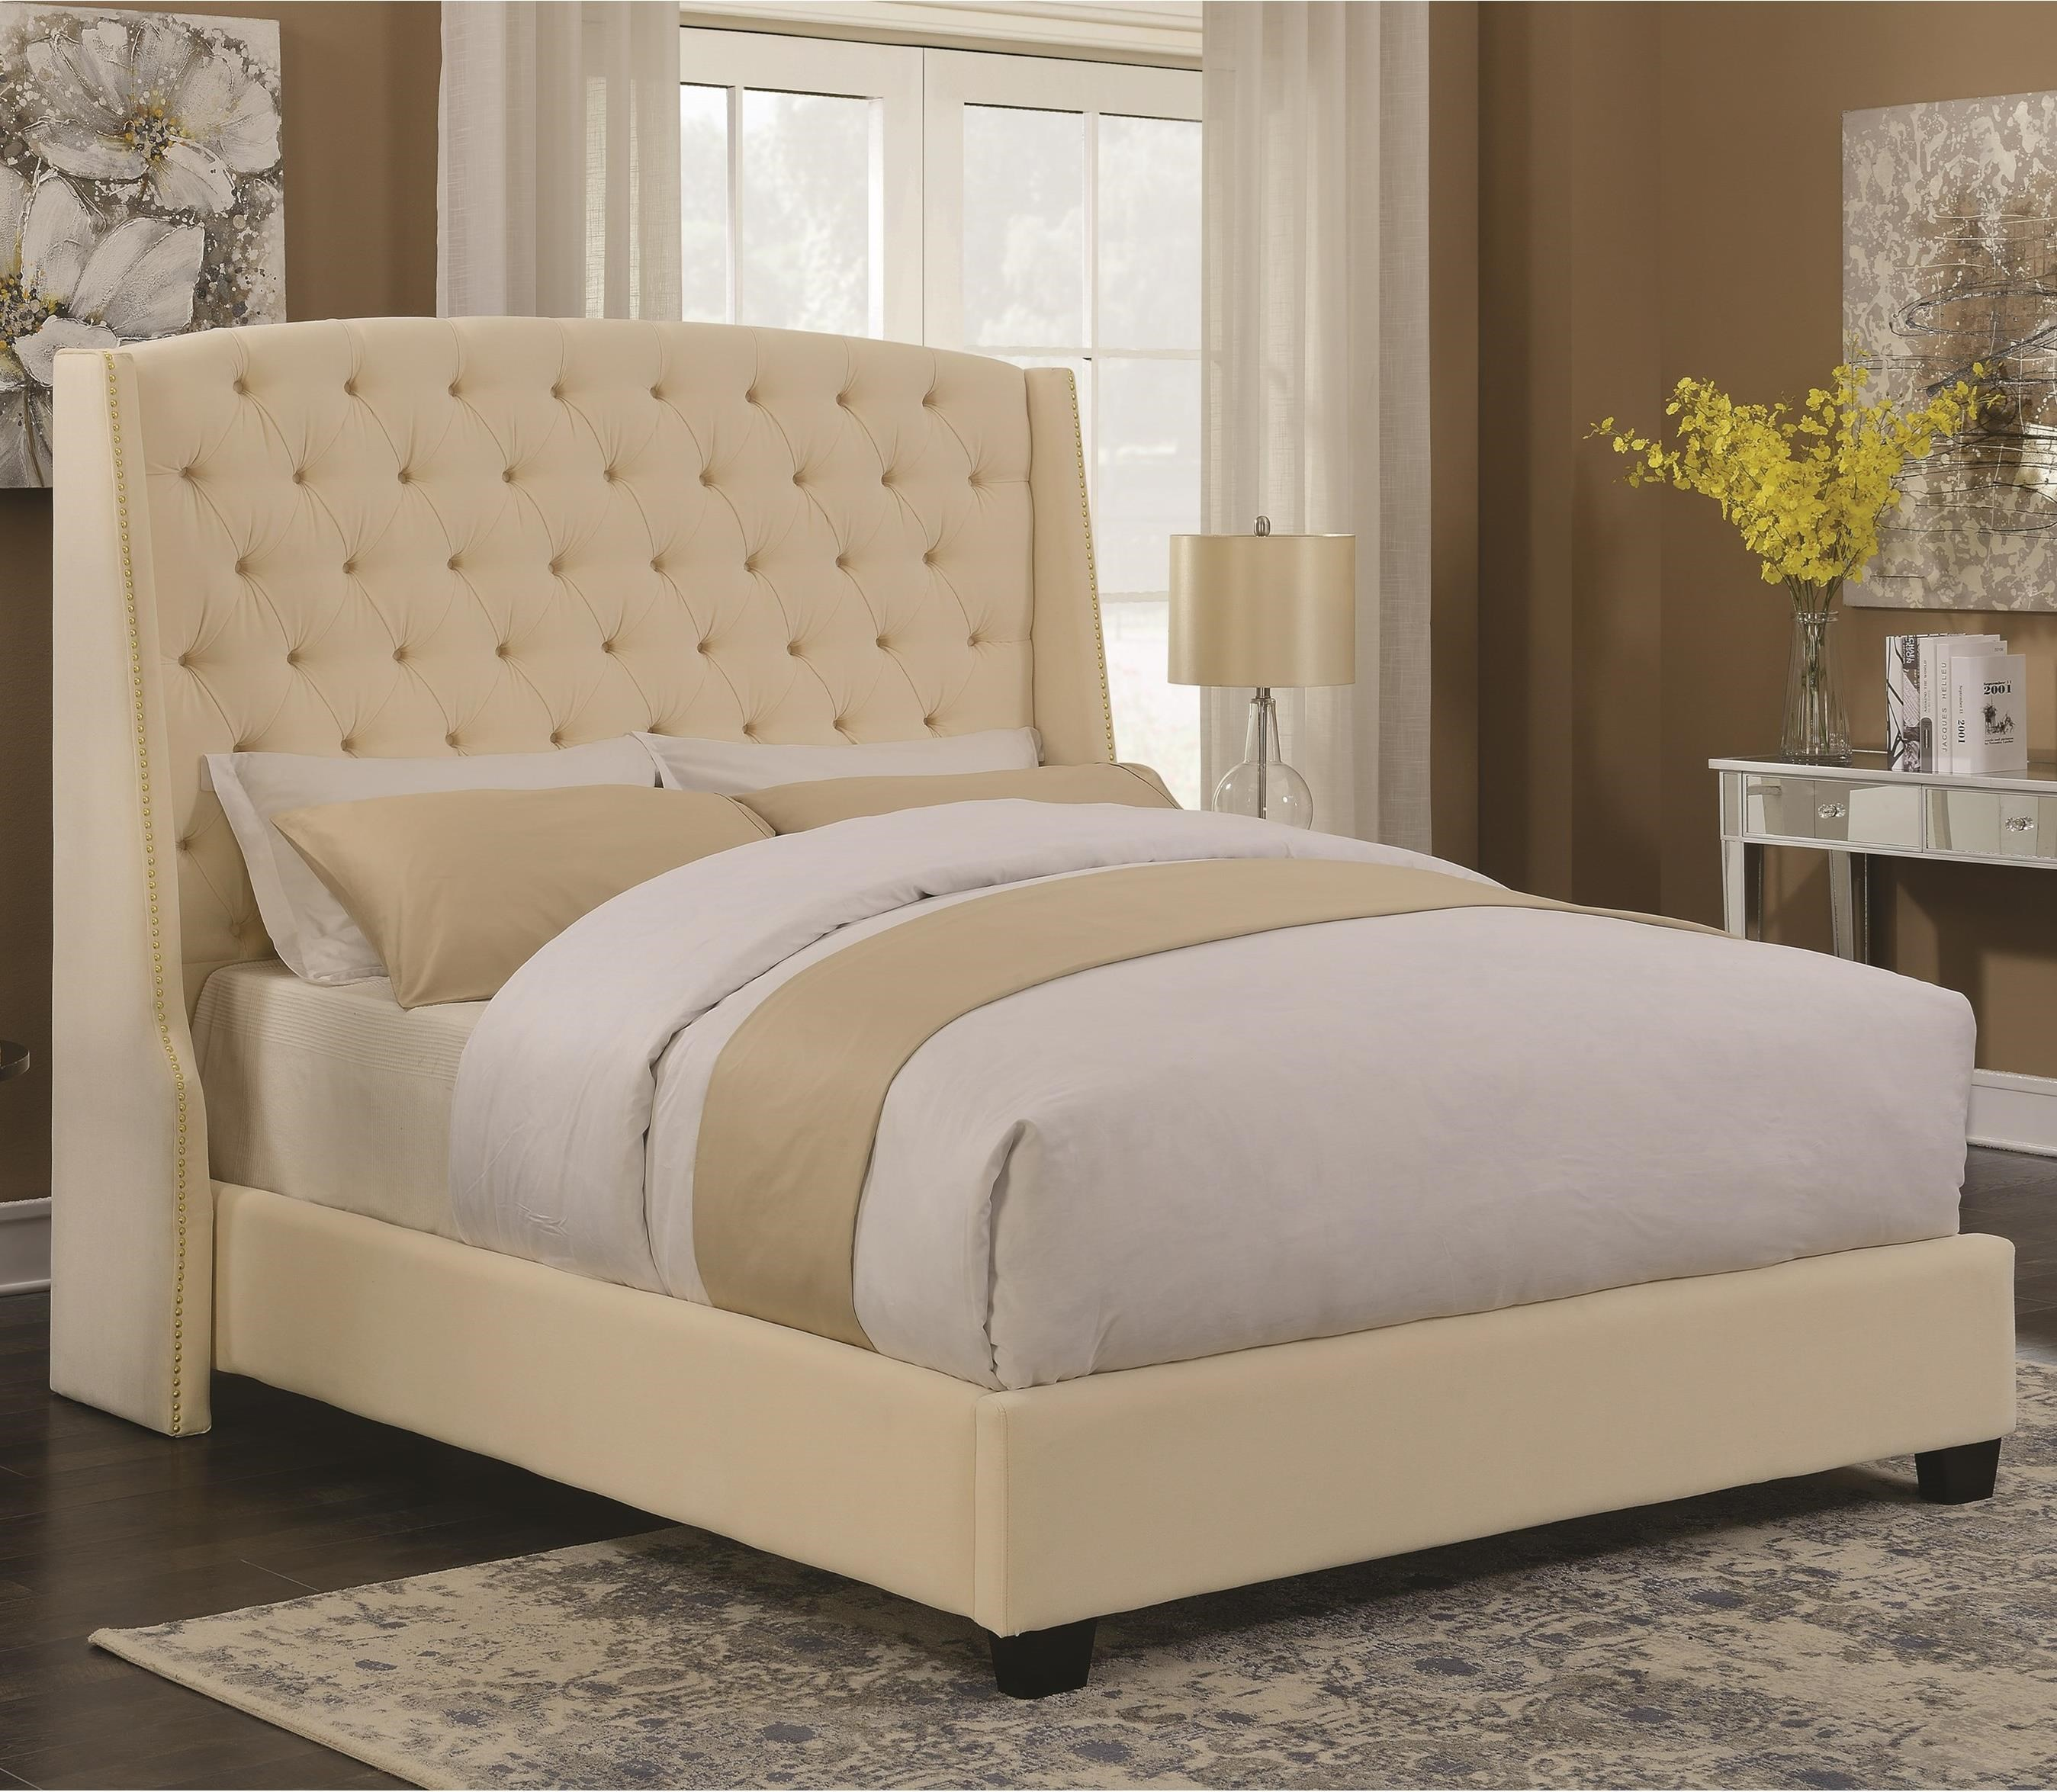 Pissarro King Bed